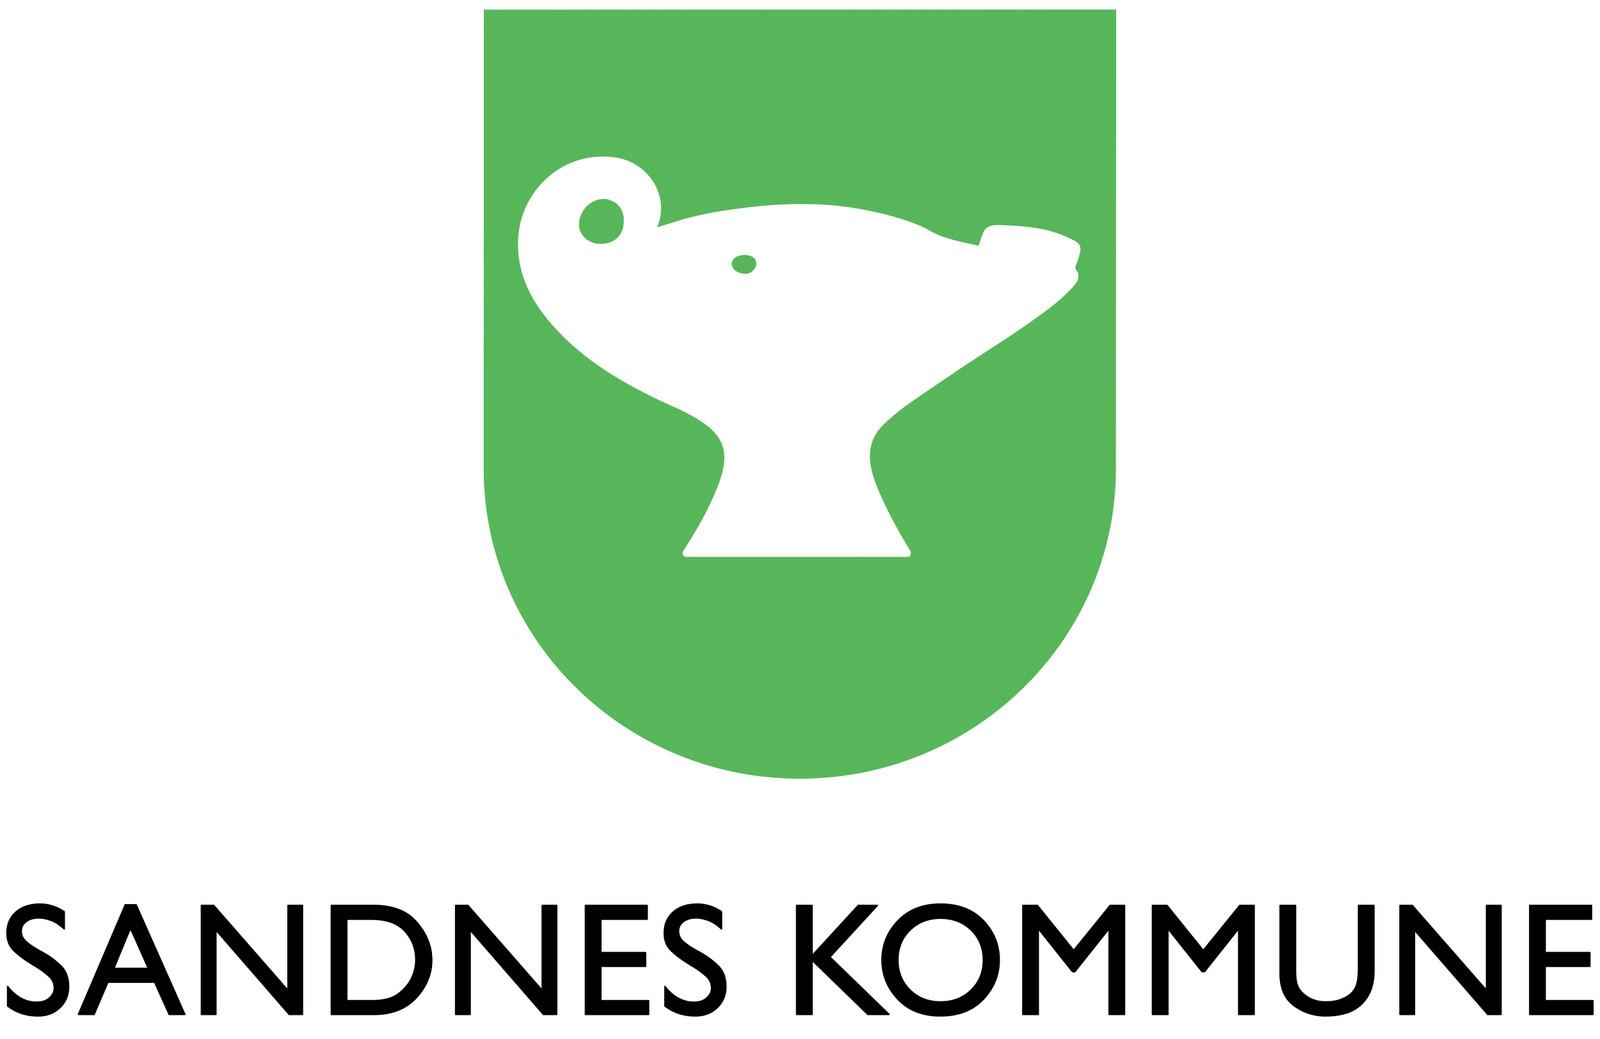 Sandnes Kommune